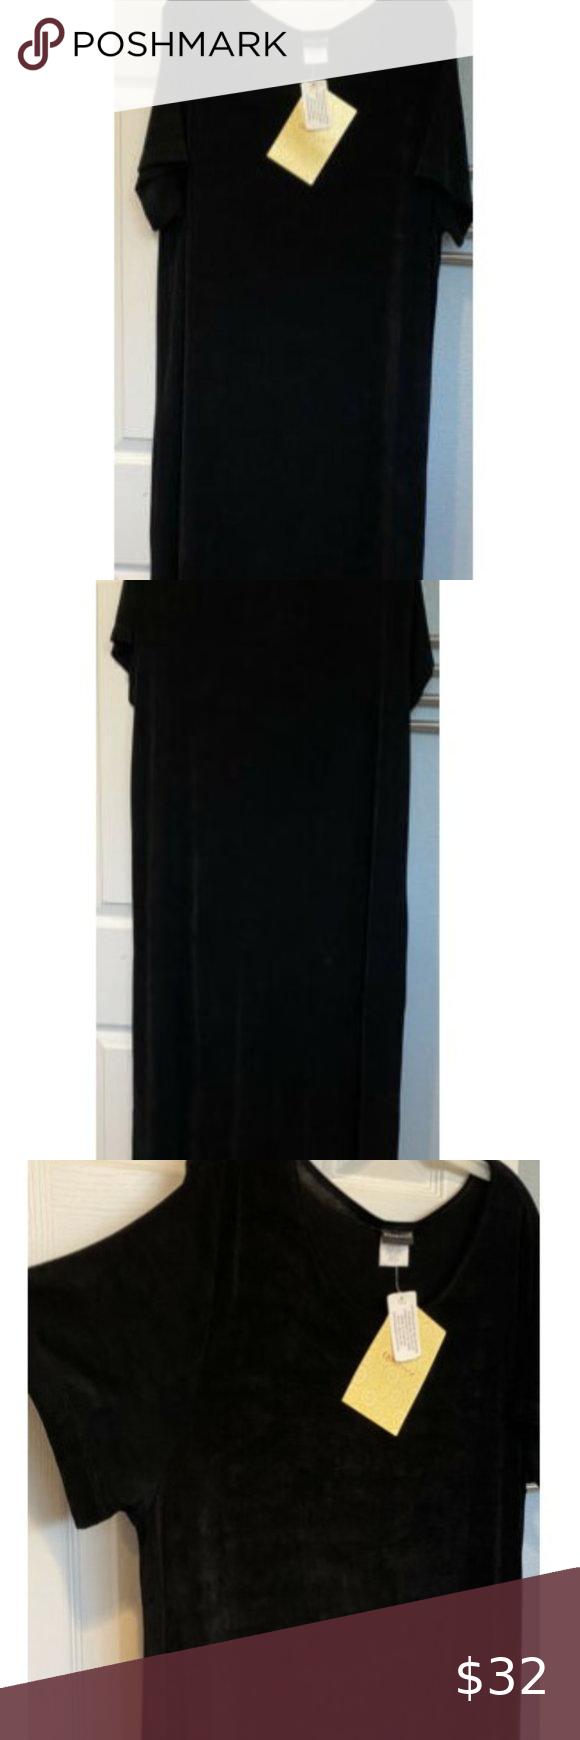 Nwt Citiknits Qvc Acetate Slinky Maxi Dress Maroon Maxi Dress Multicolor Maxi Dress Navy Blue Maxi Dress [ 1740 x 580 Pixel ]